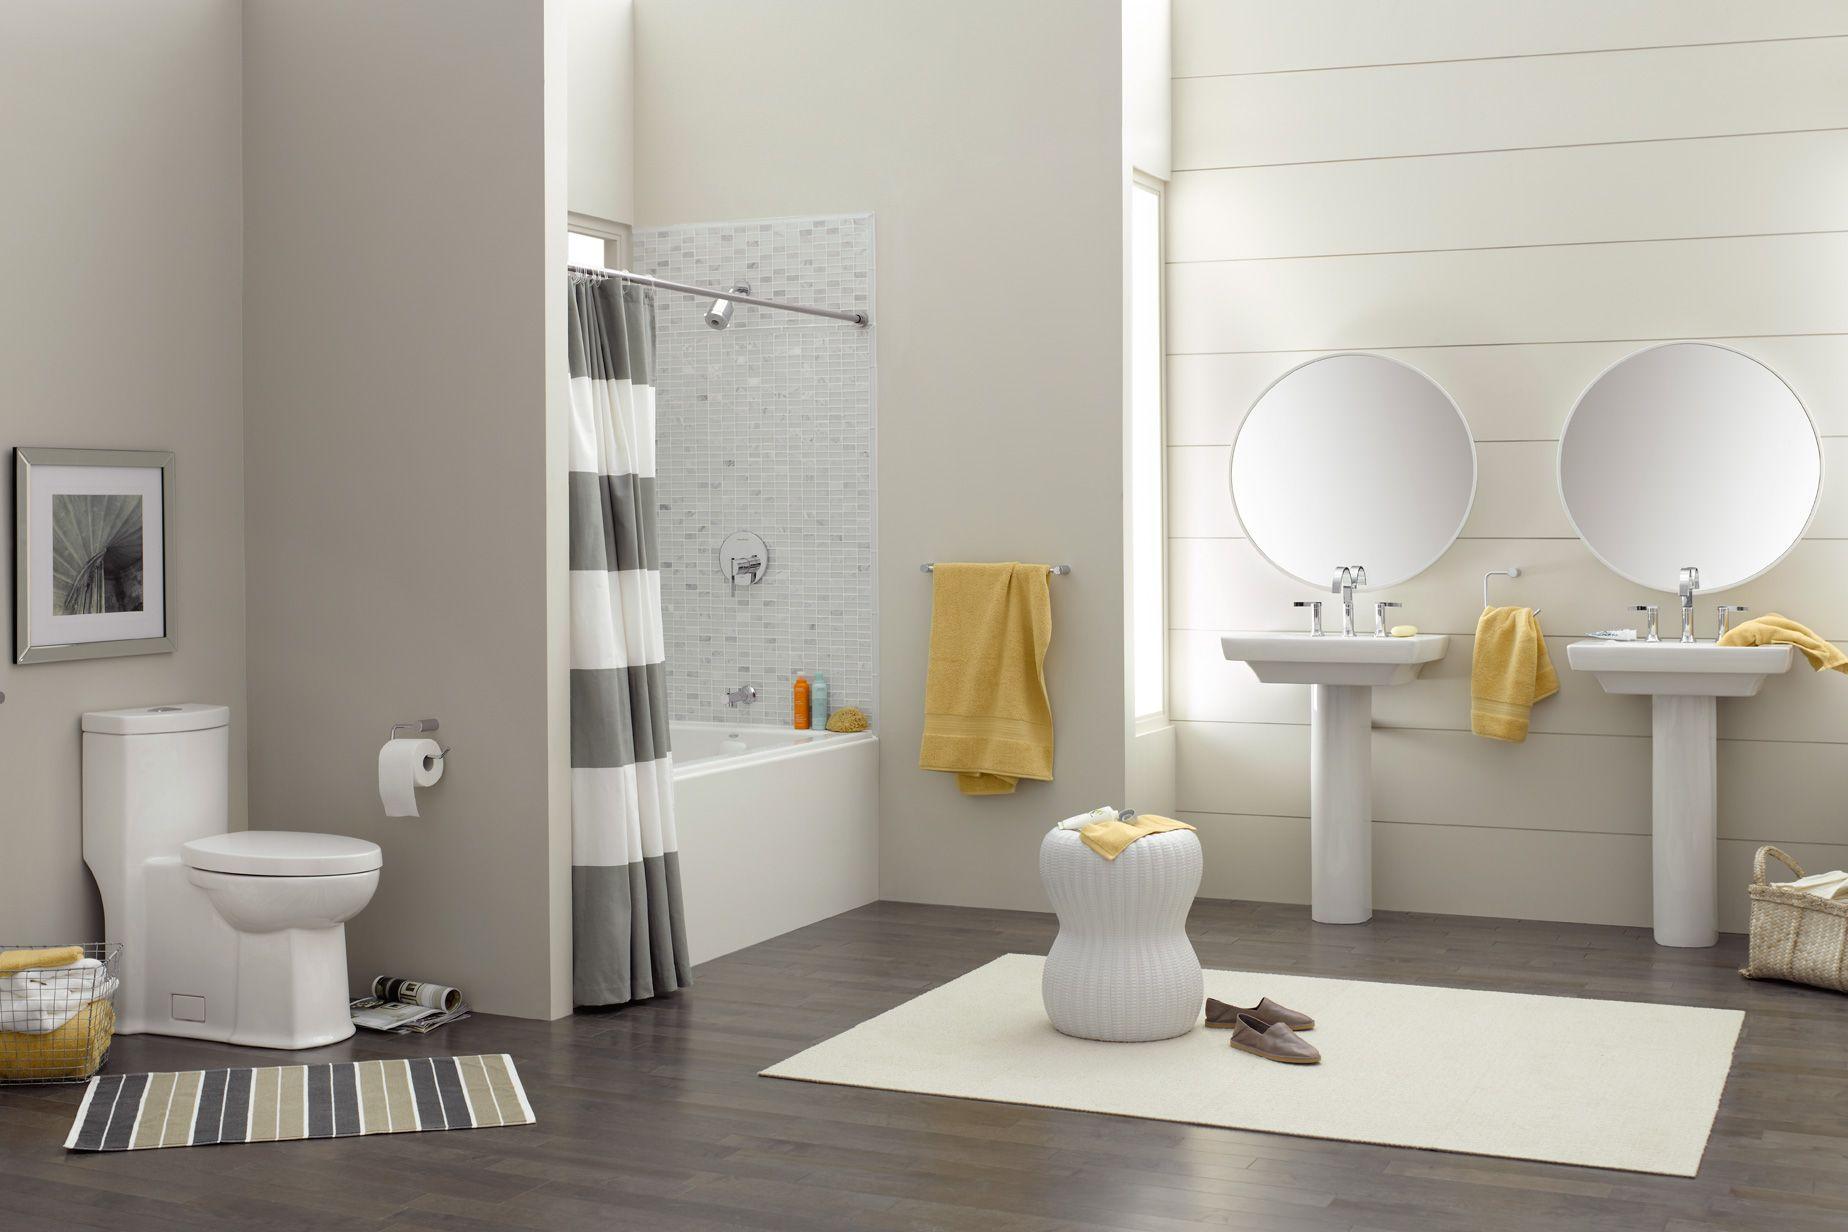 Amati Canada bathrooms and products || good quality bathroom ...